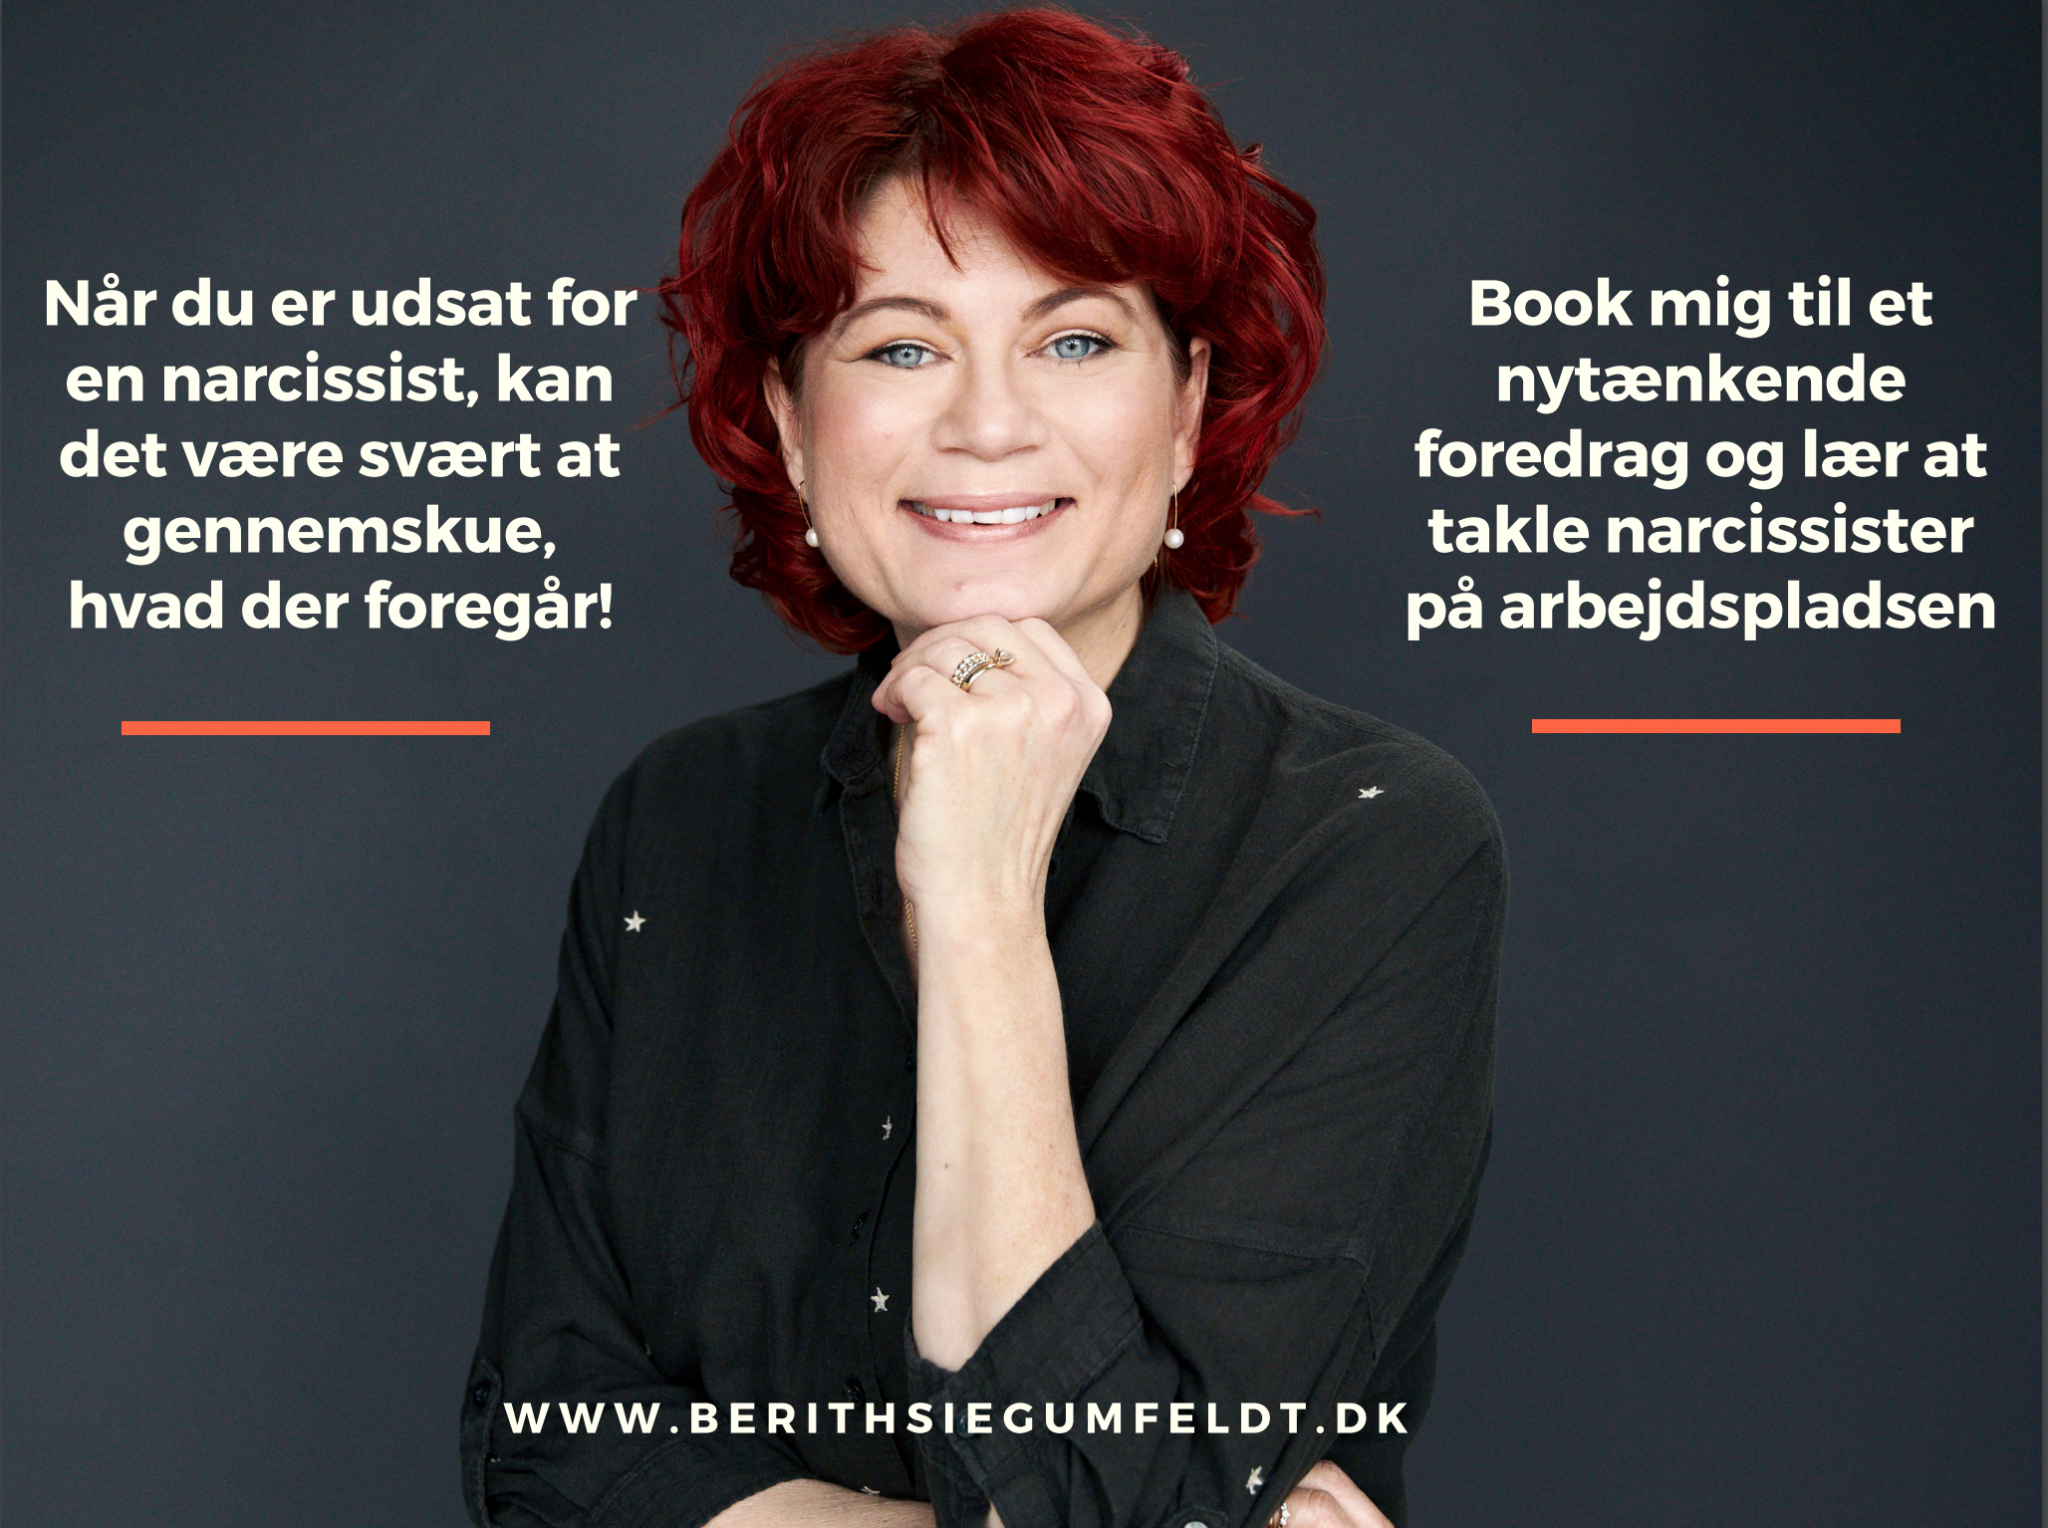 Berith Siegumfeldt Foredrag